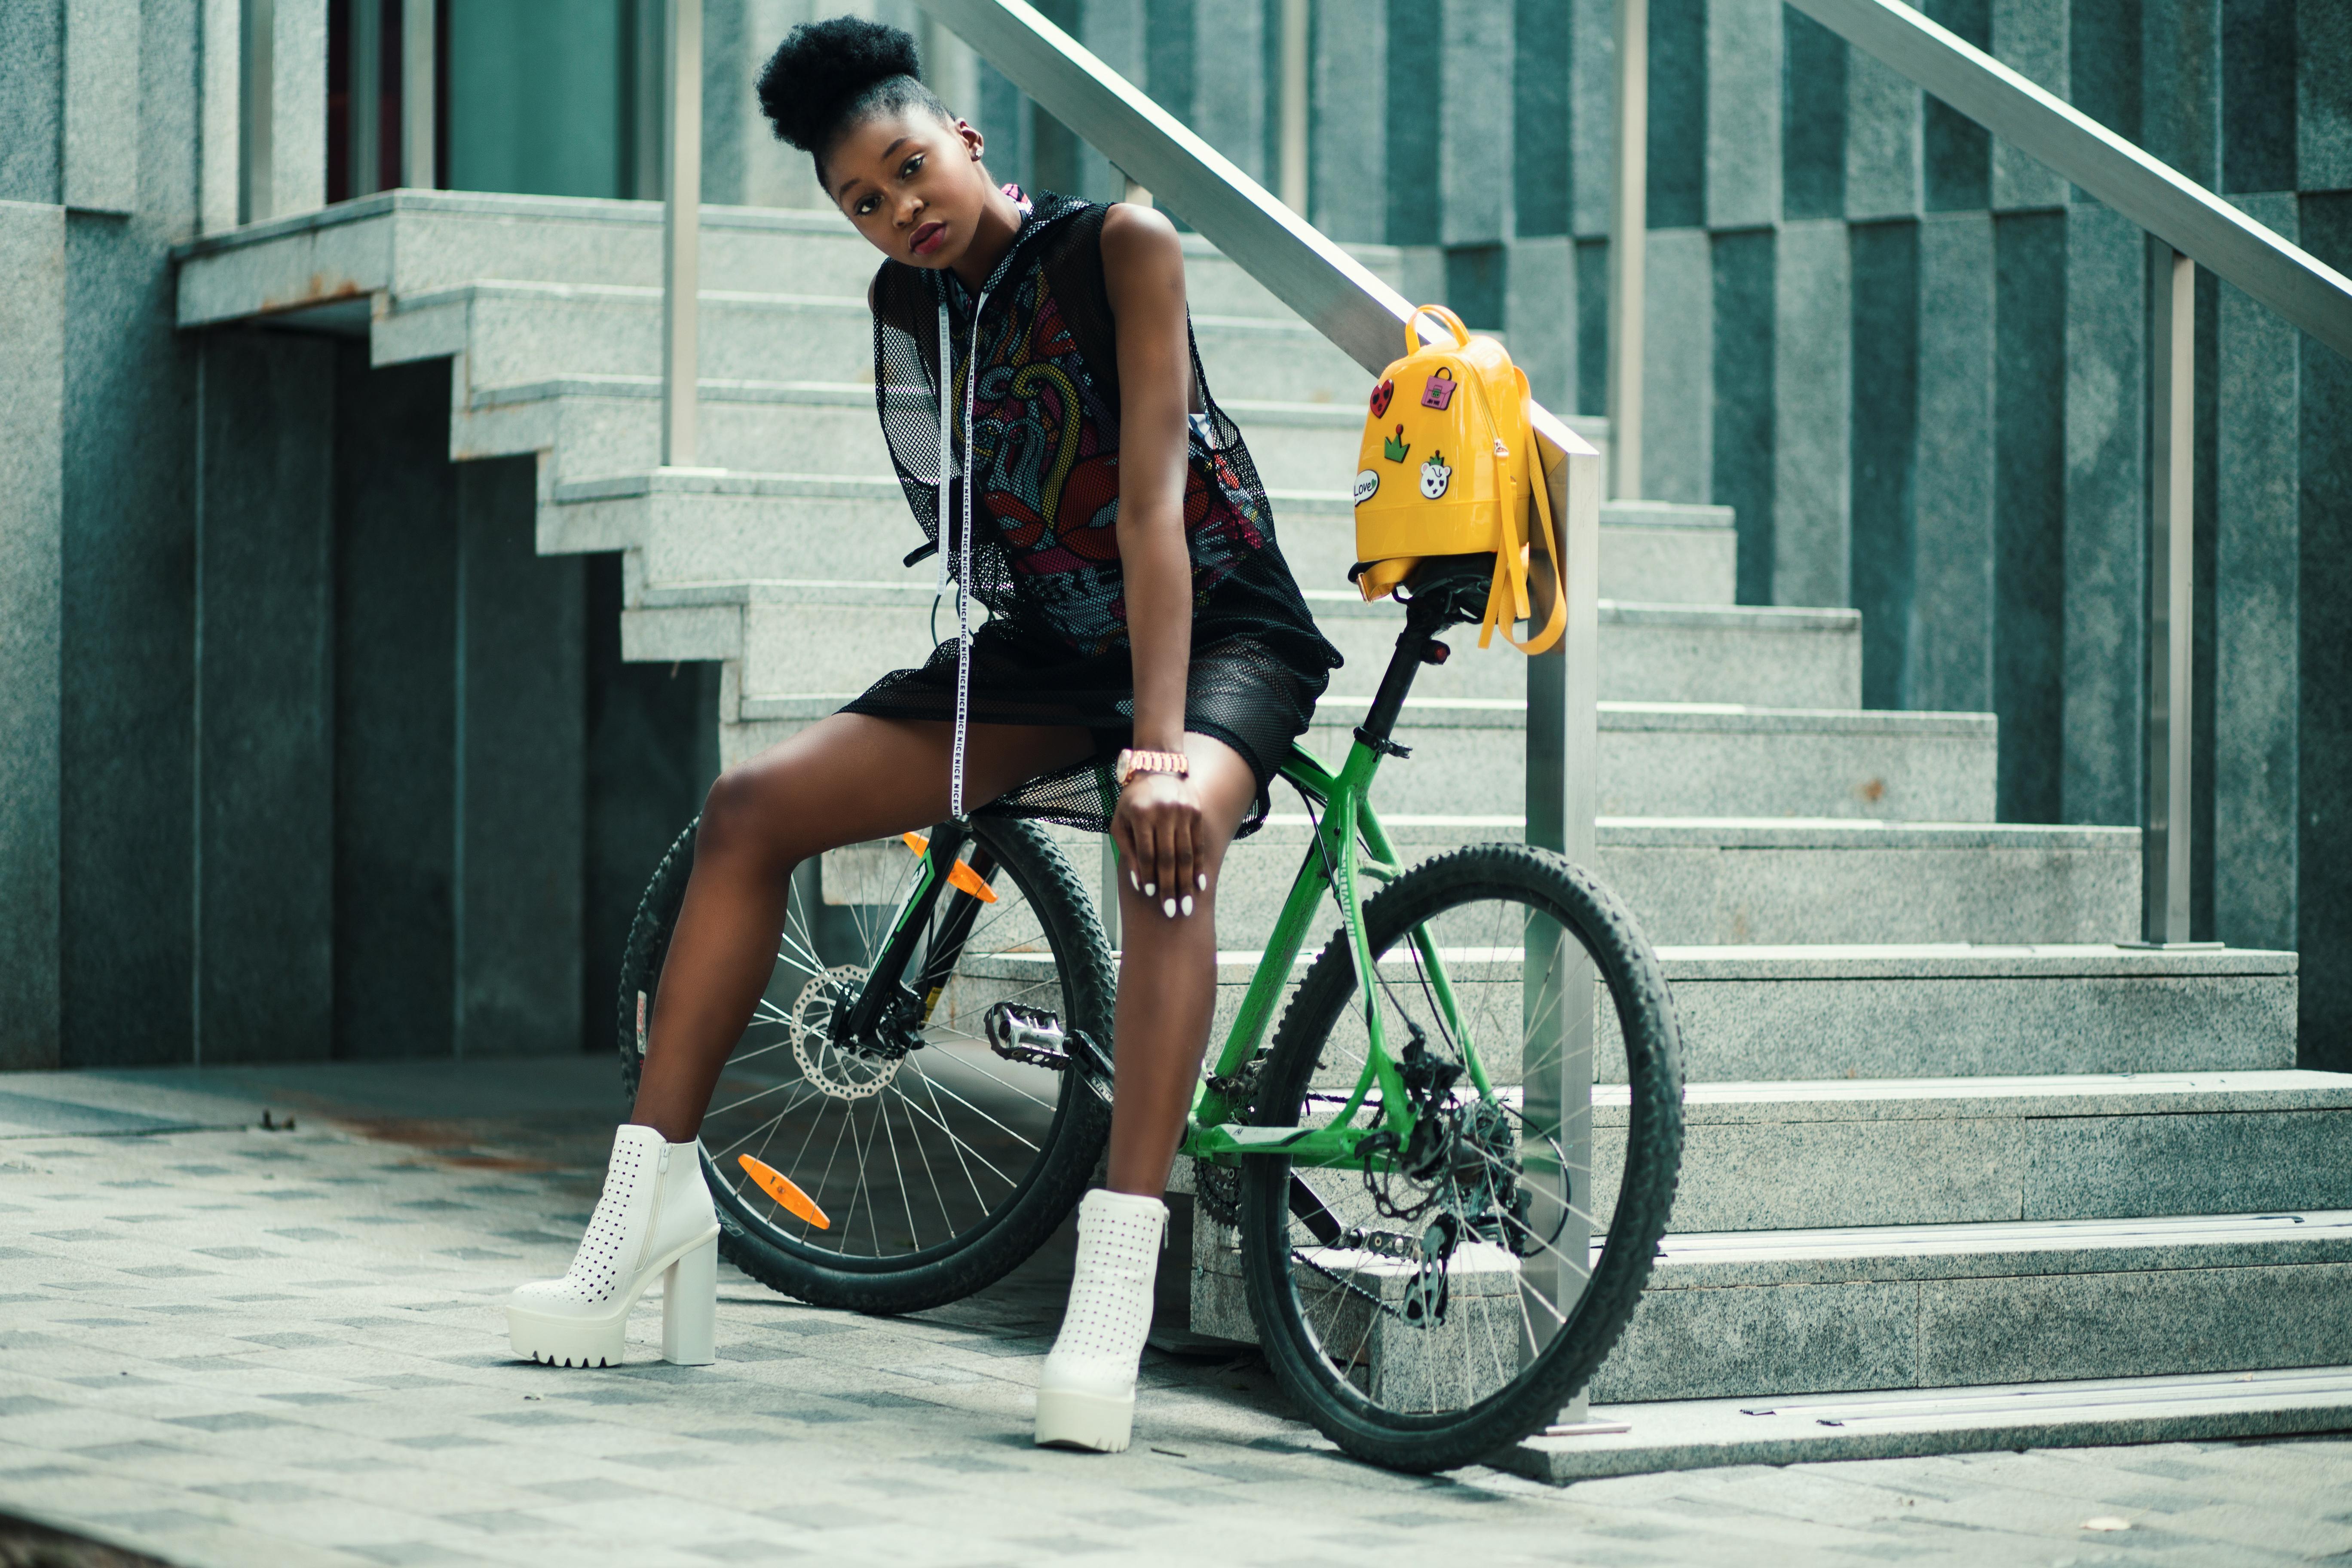 Woman in Black Sleeveless Dress Sitting on Green Bike